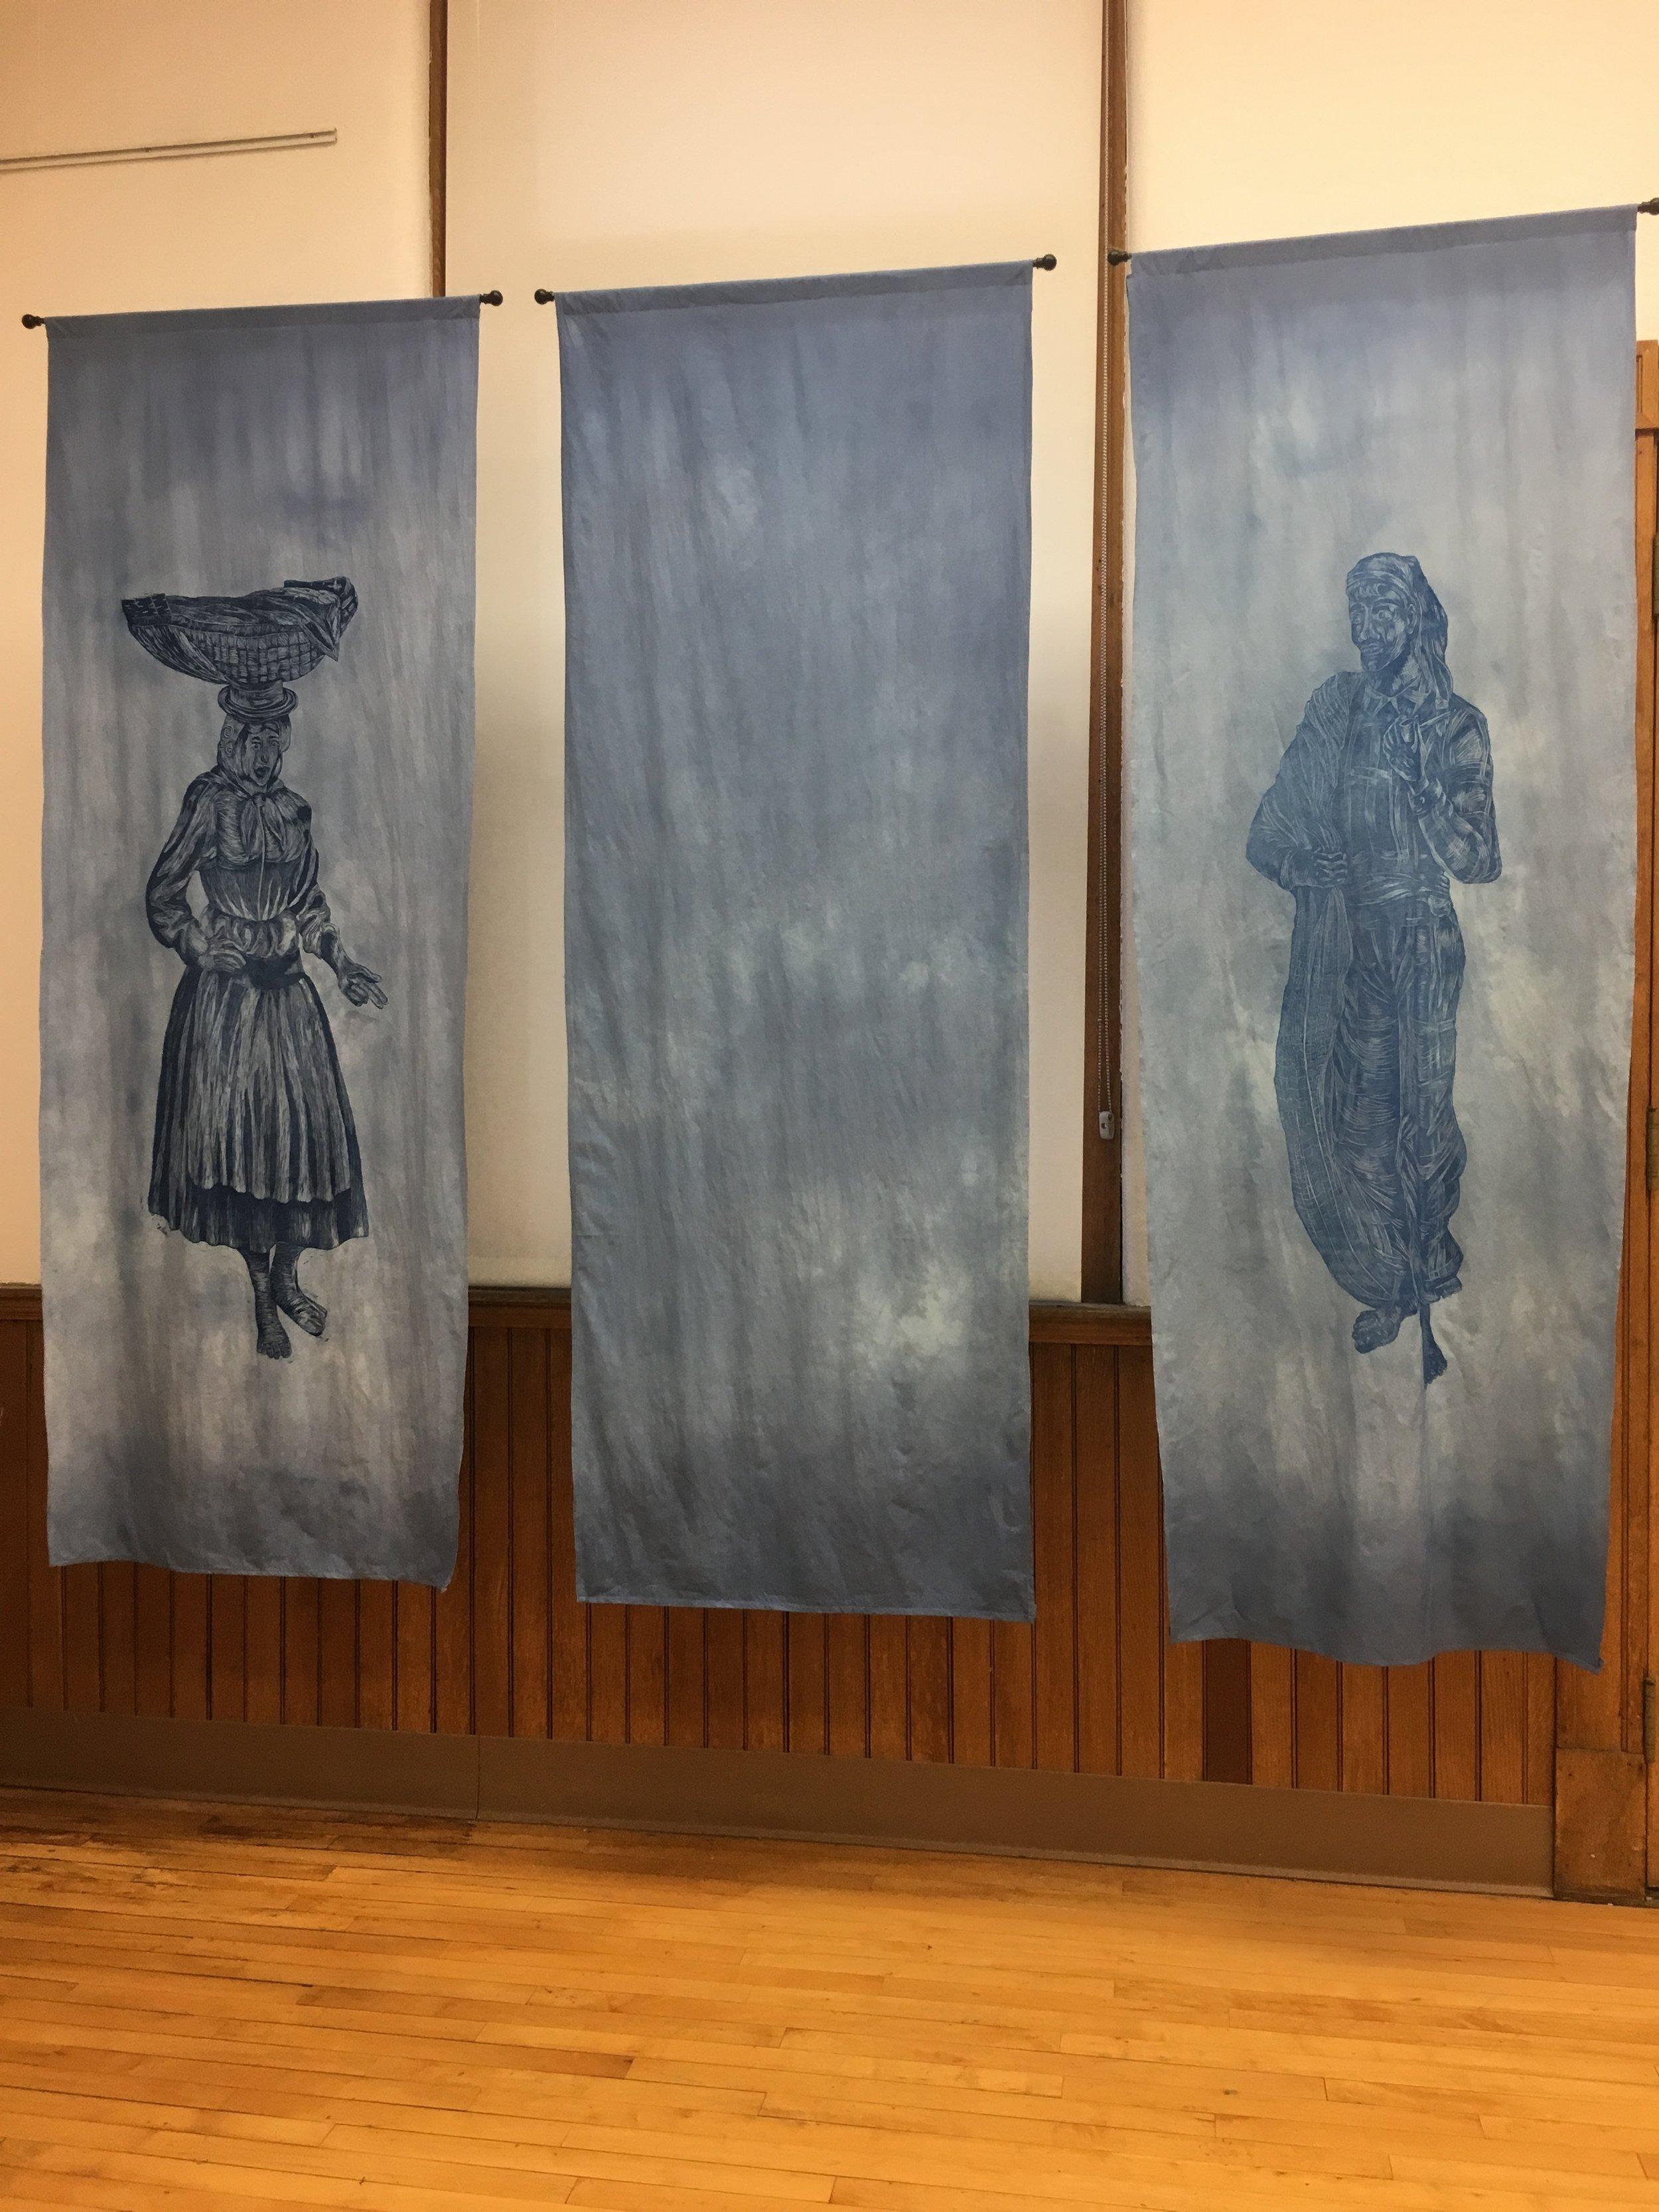 Varina,Peixinhos, and  Pescador, Gabriella Sapata.Woodcut on muslin and animation.Image courtesy of Lauren Darpel.